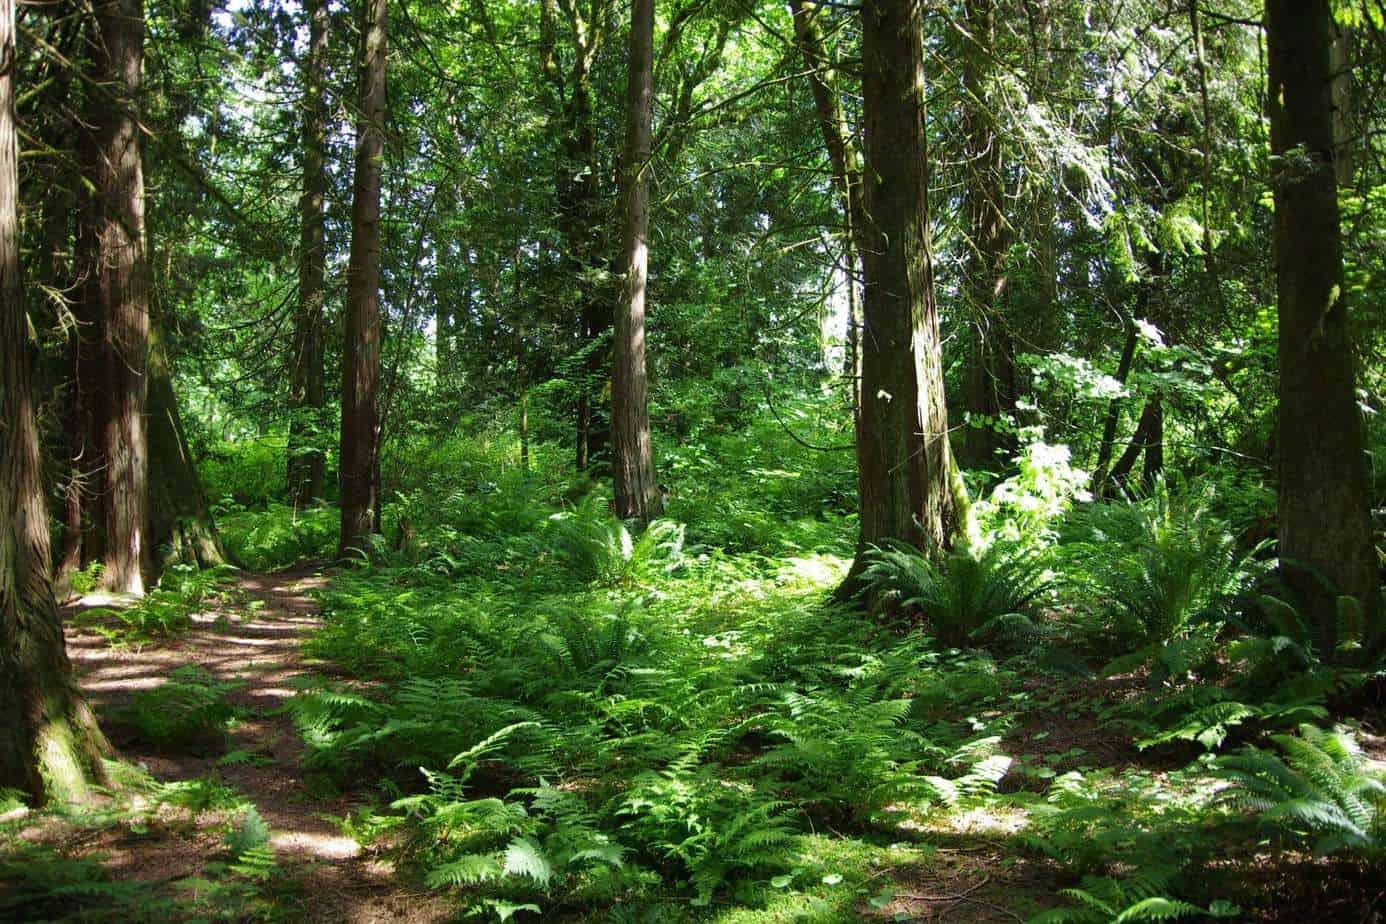 046-blaauw-forest-full